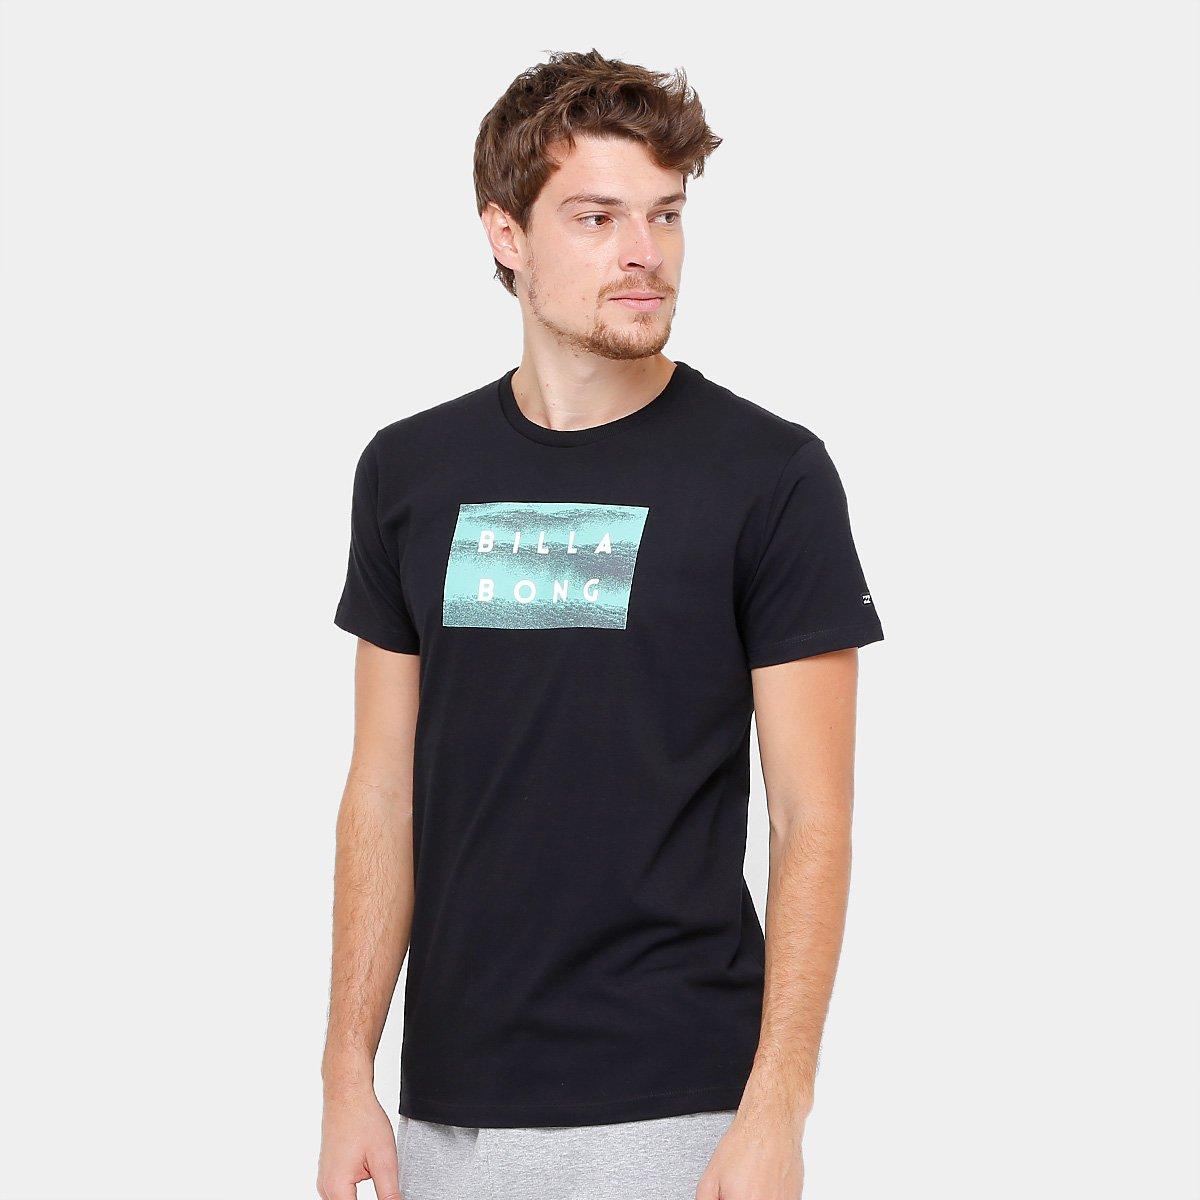 Camiseta Billabong Fill Die Cut Masculina - Compre Agora  8af30c76bab